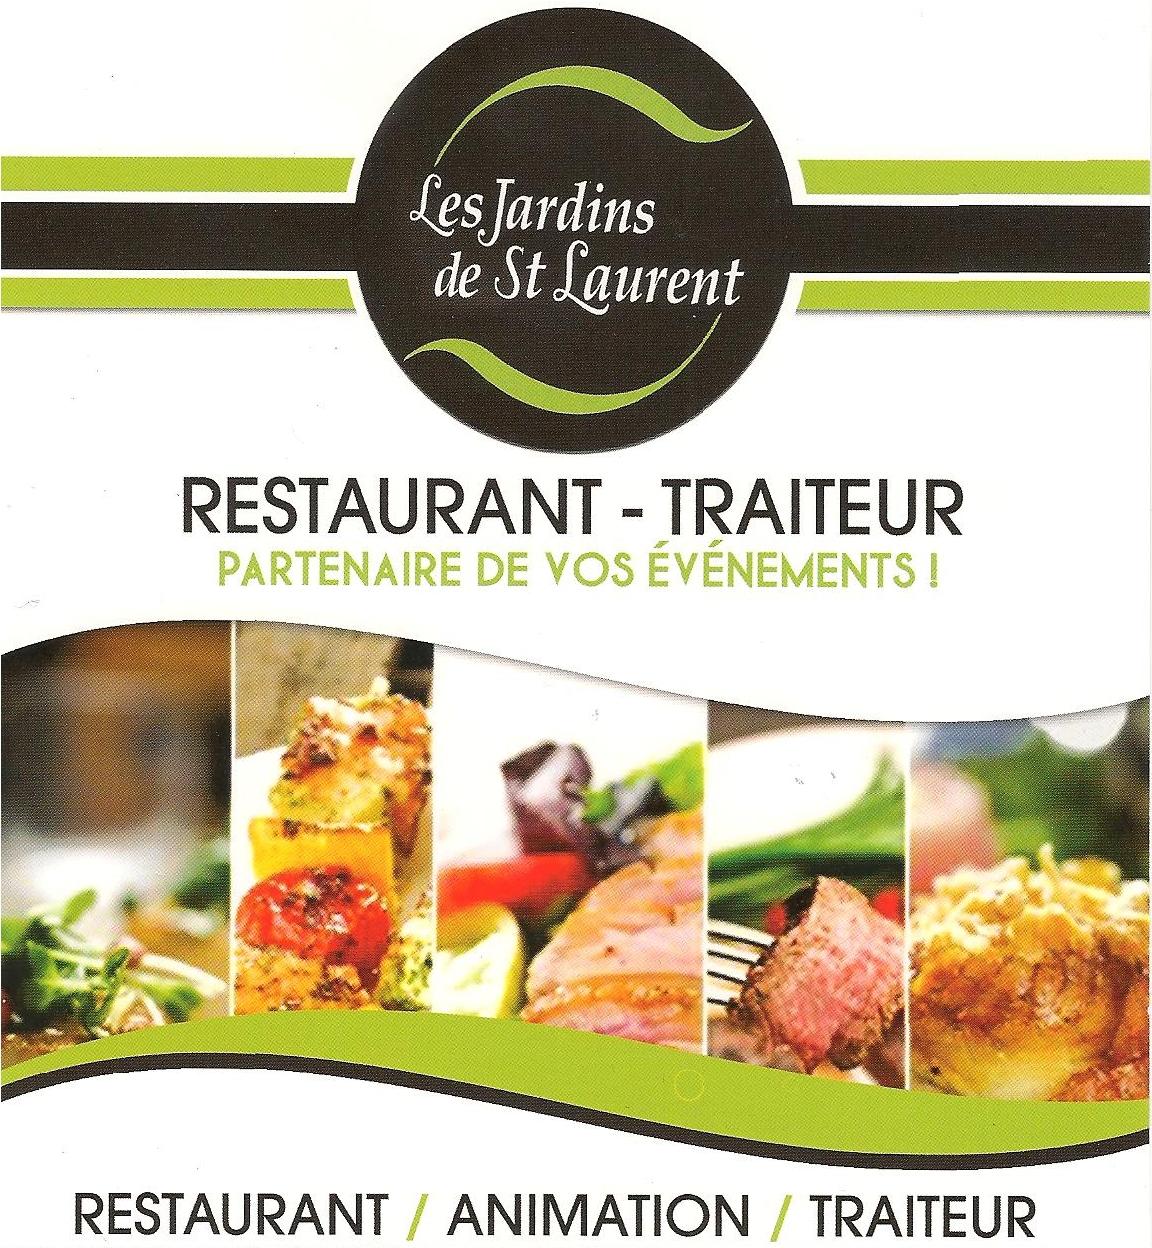 https://tti.asso.fr/wp-content/uploads/2017/04/jardin_slb1.jpg